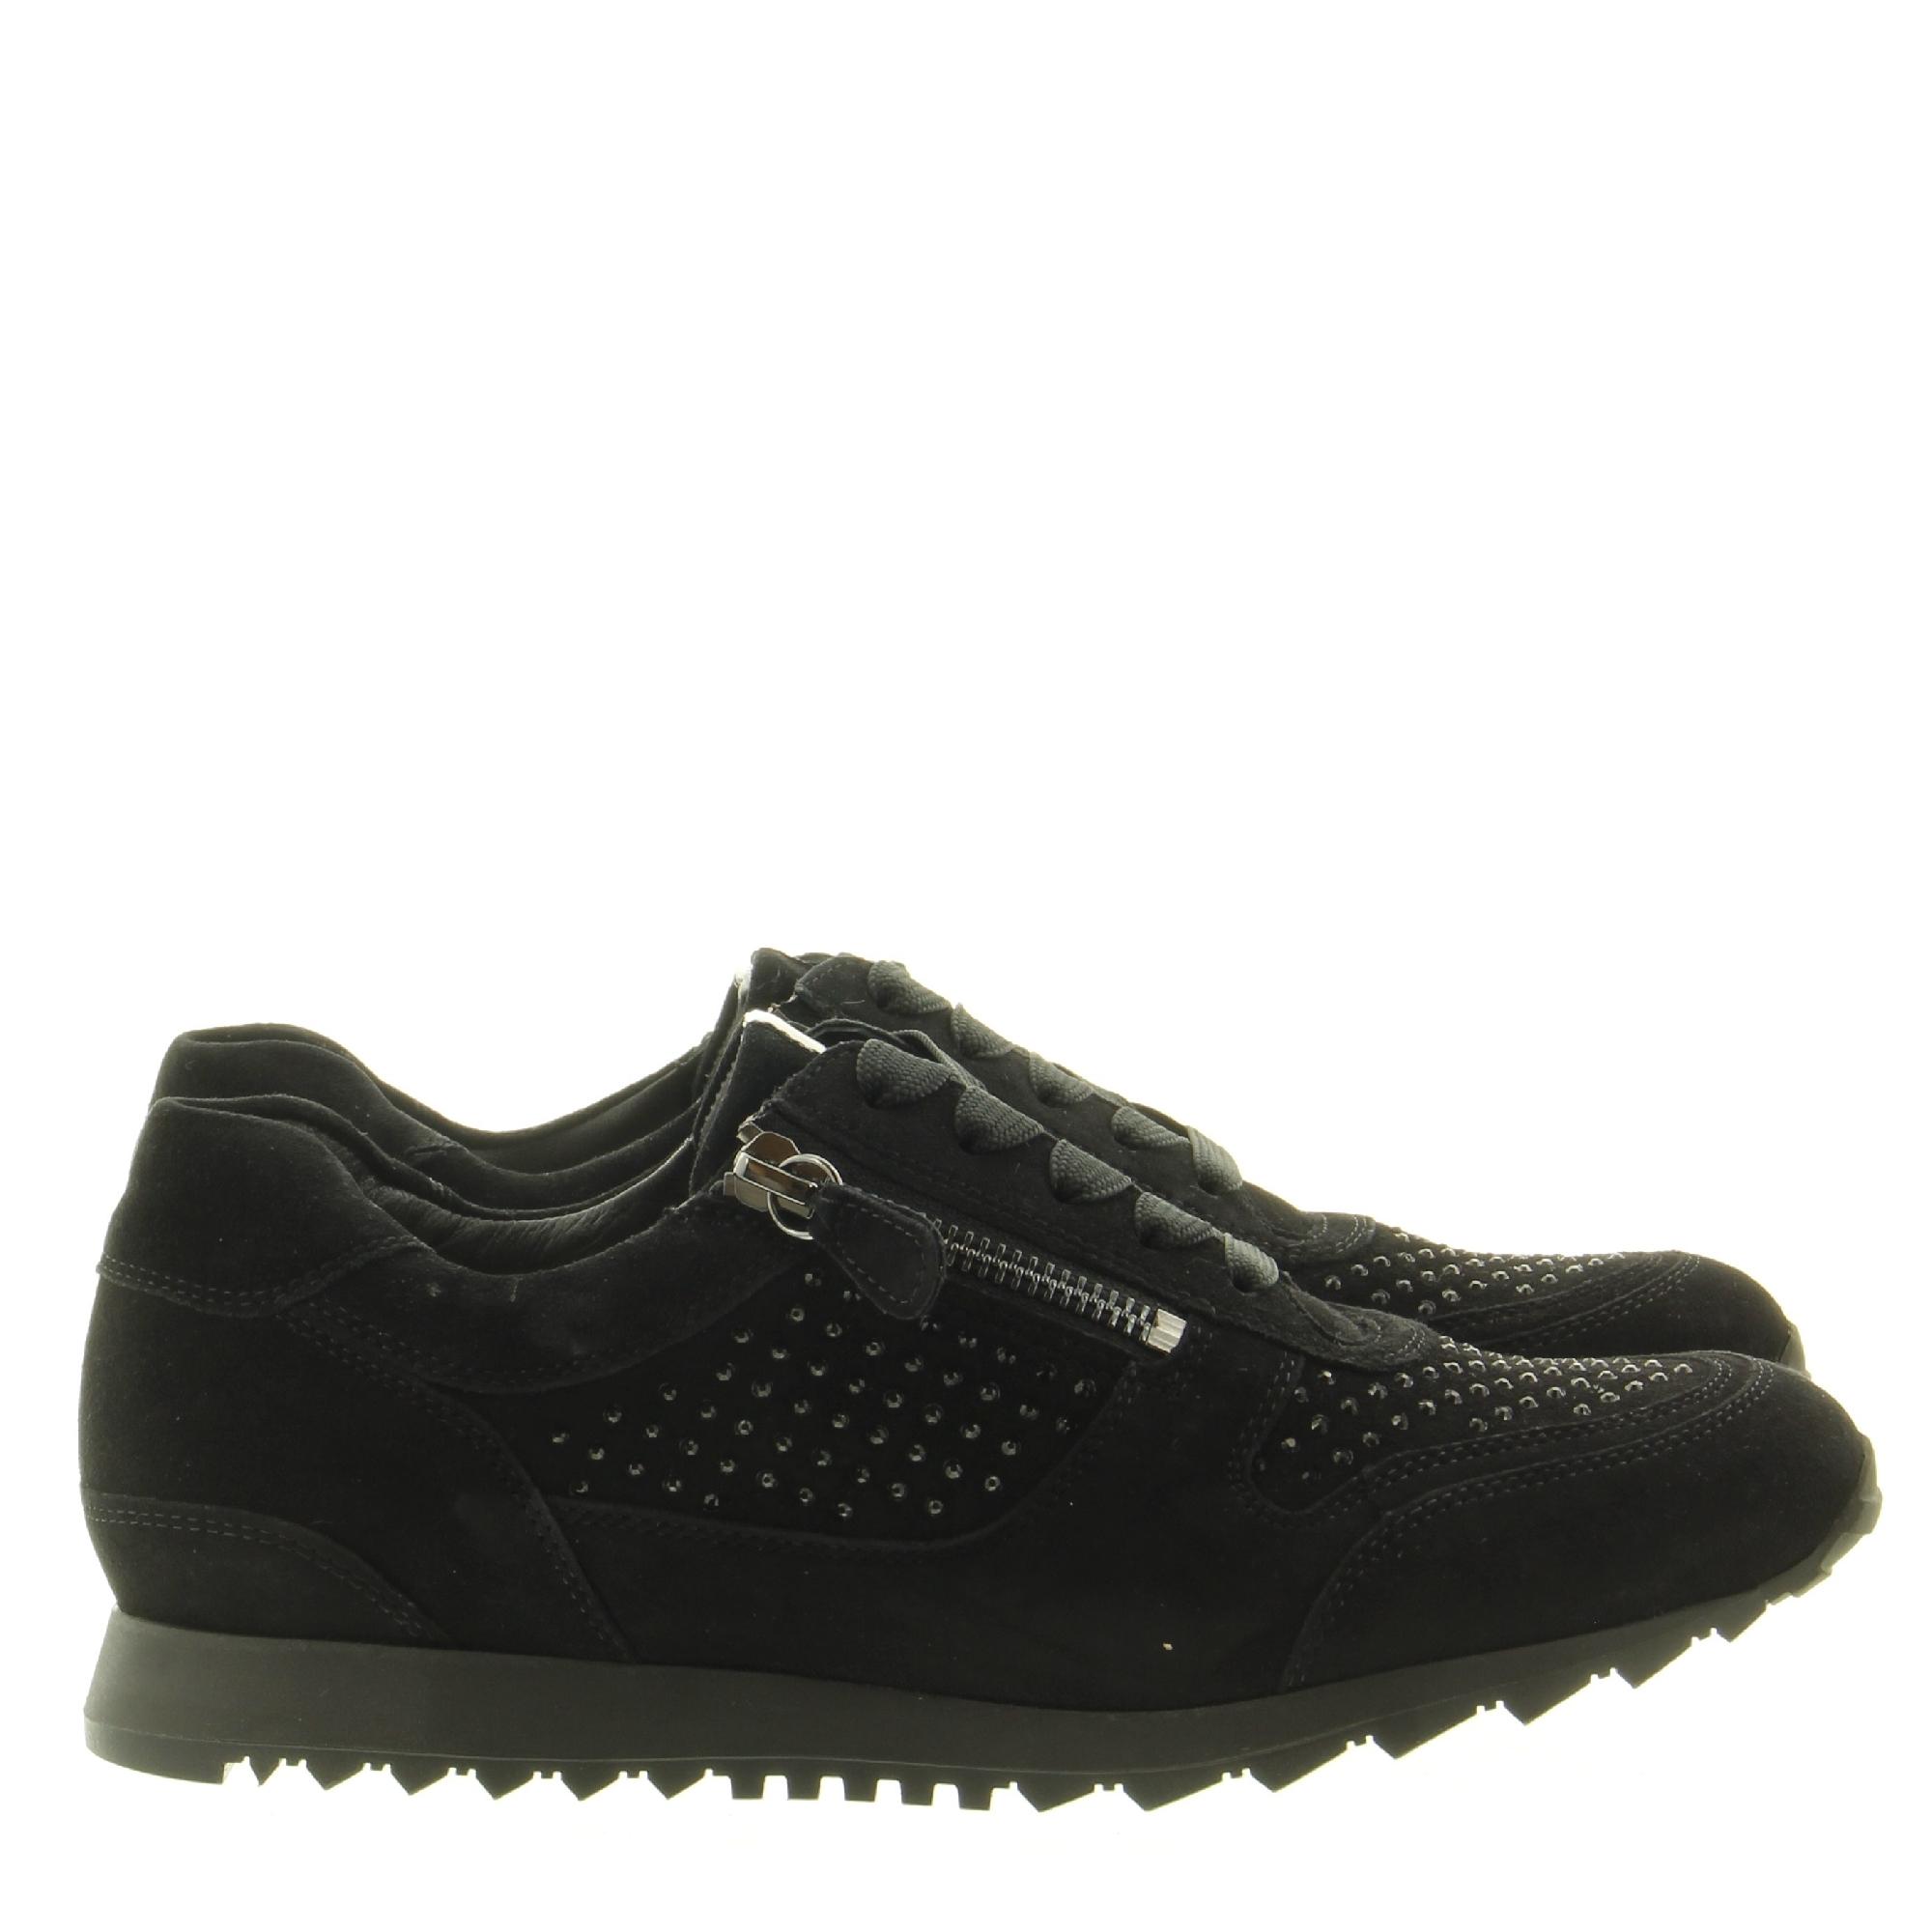 Hassia Shoes 301932 Barcelona 0100 Schwarz